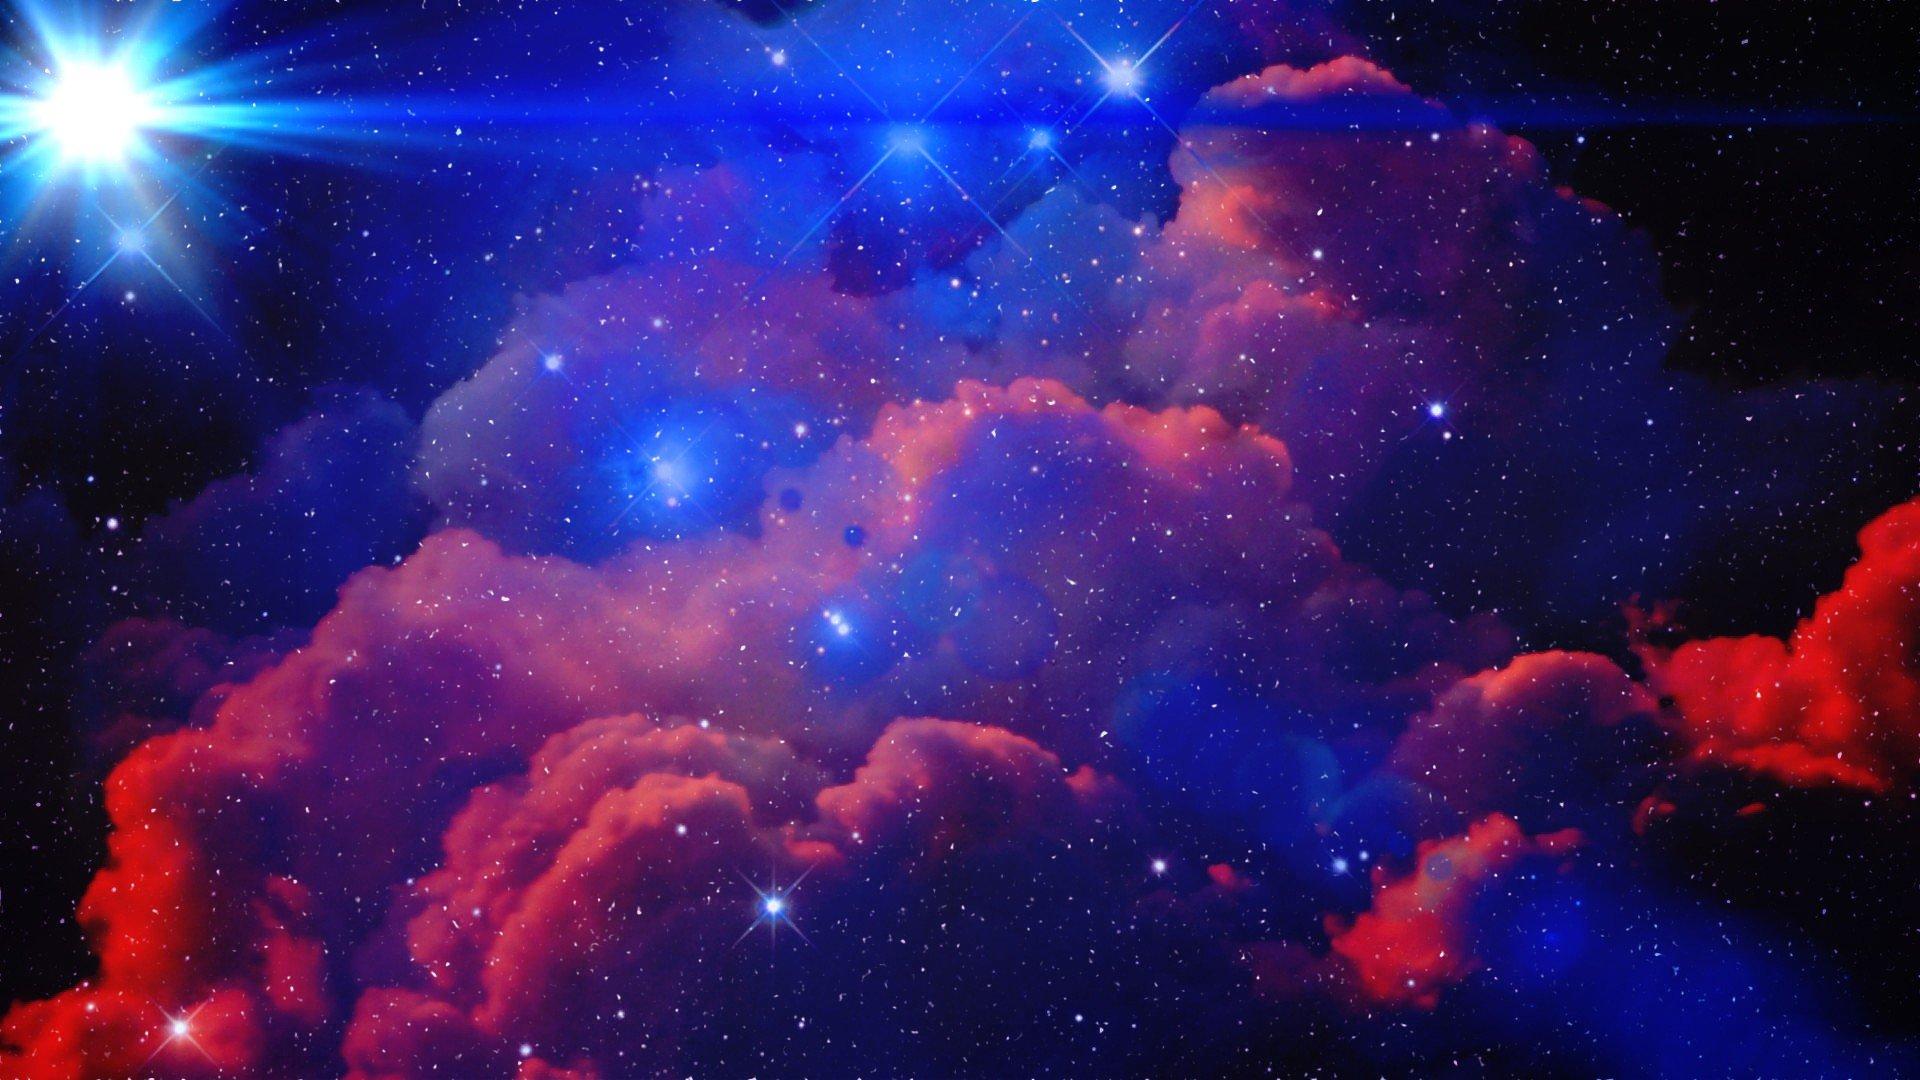 wallpaper 1920x1080 px clouds